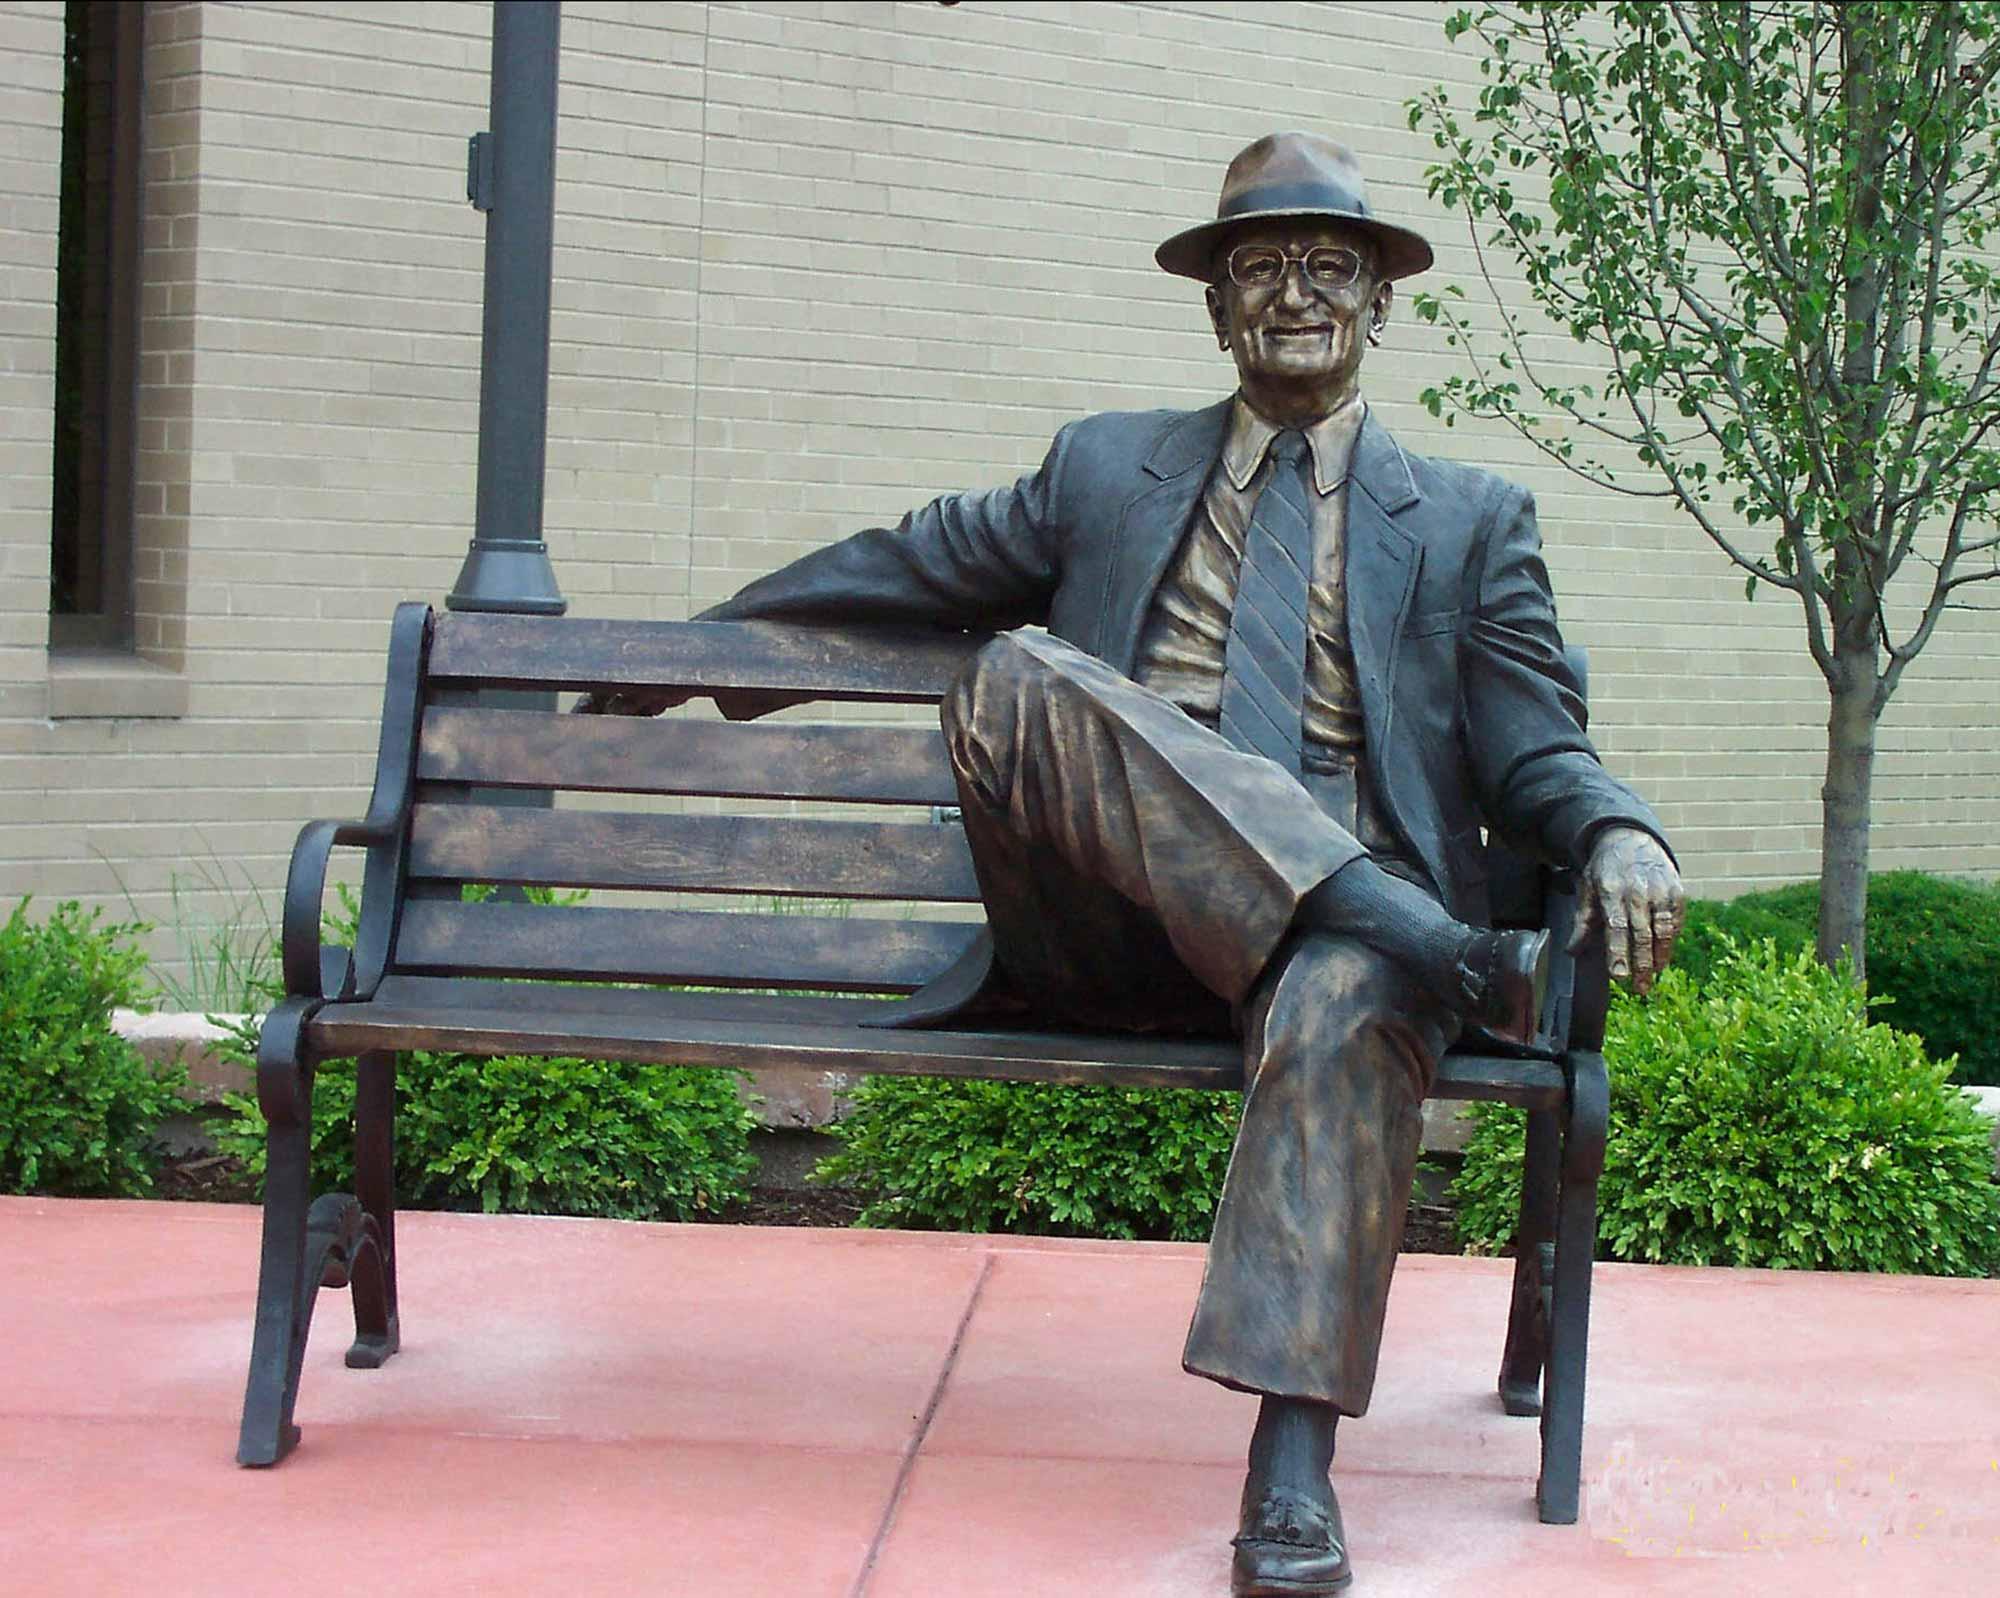 Mayor Ernest Kolb